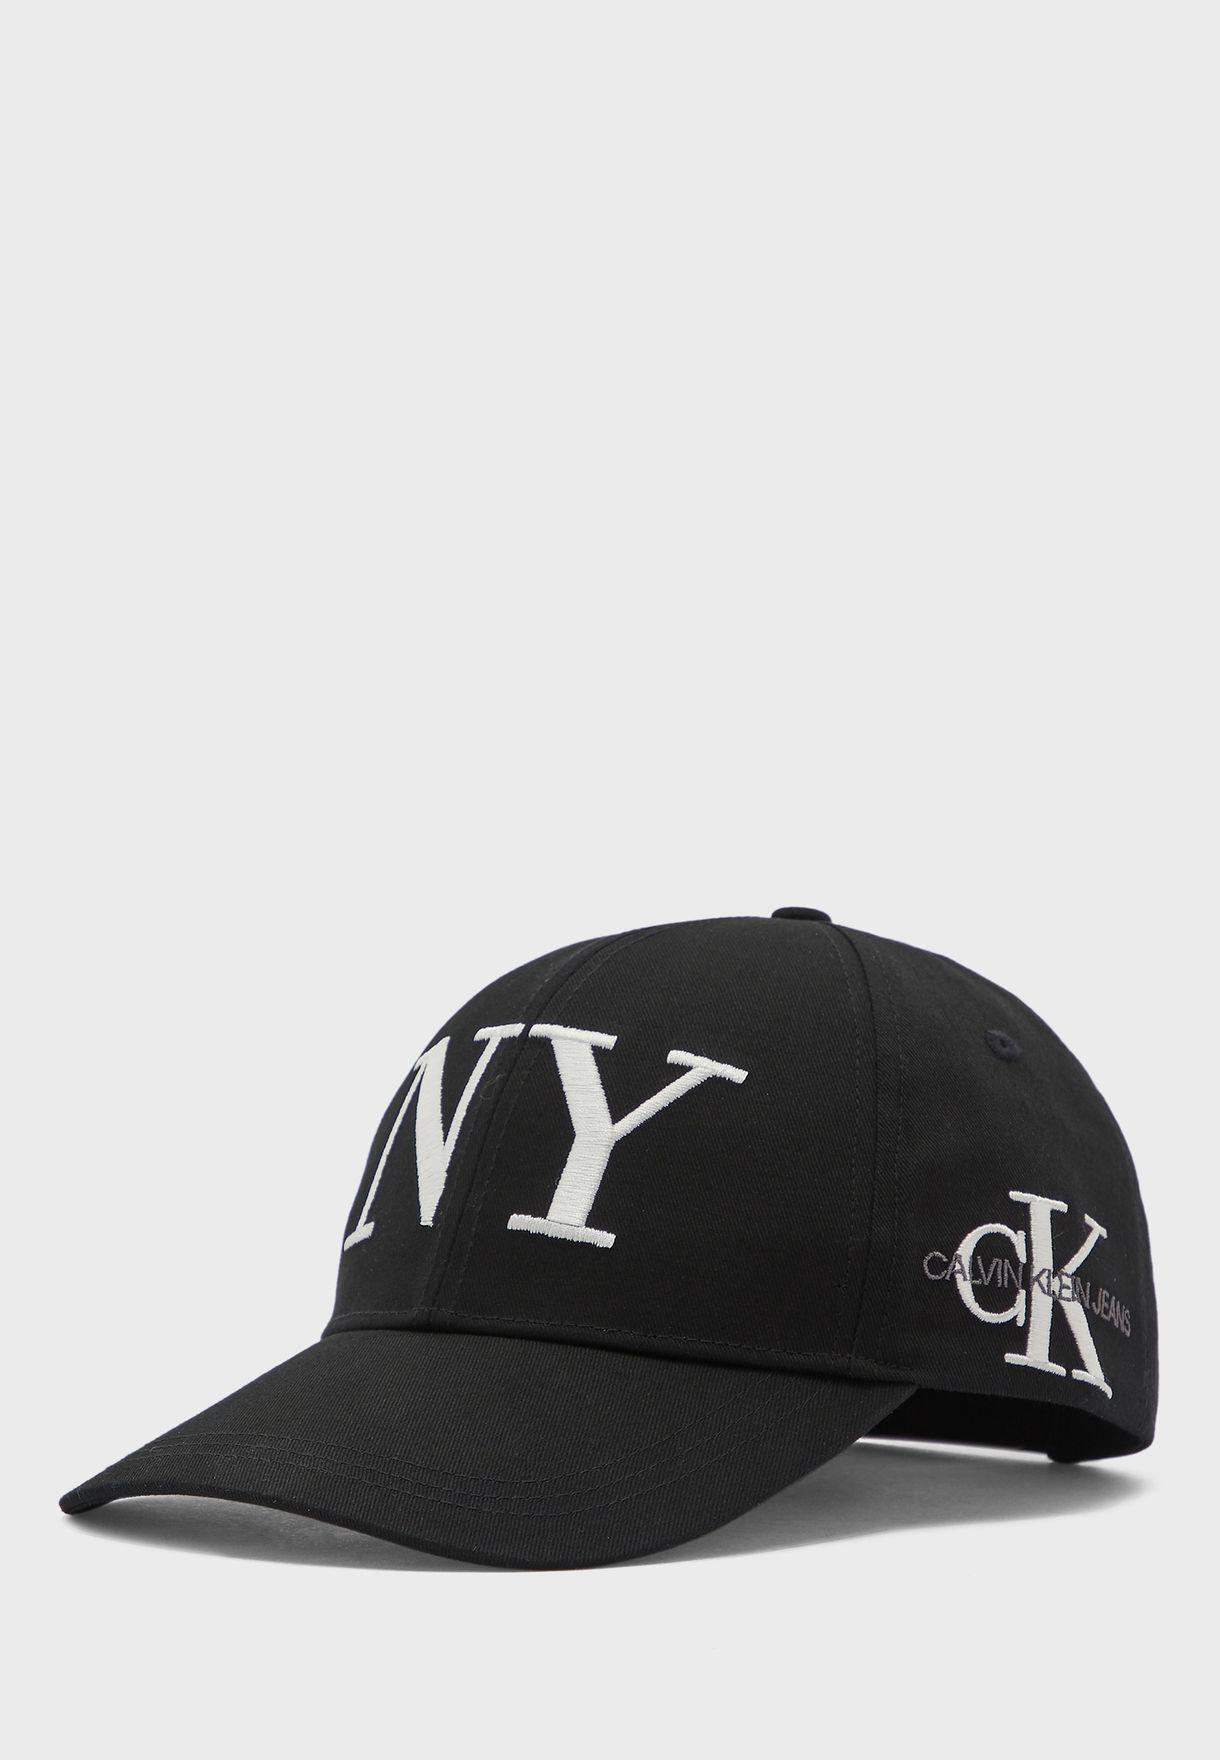 Embroidered Logo Curved Peak Cap